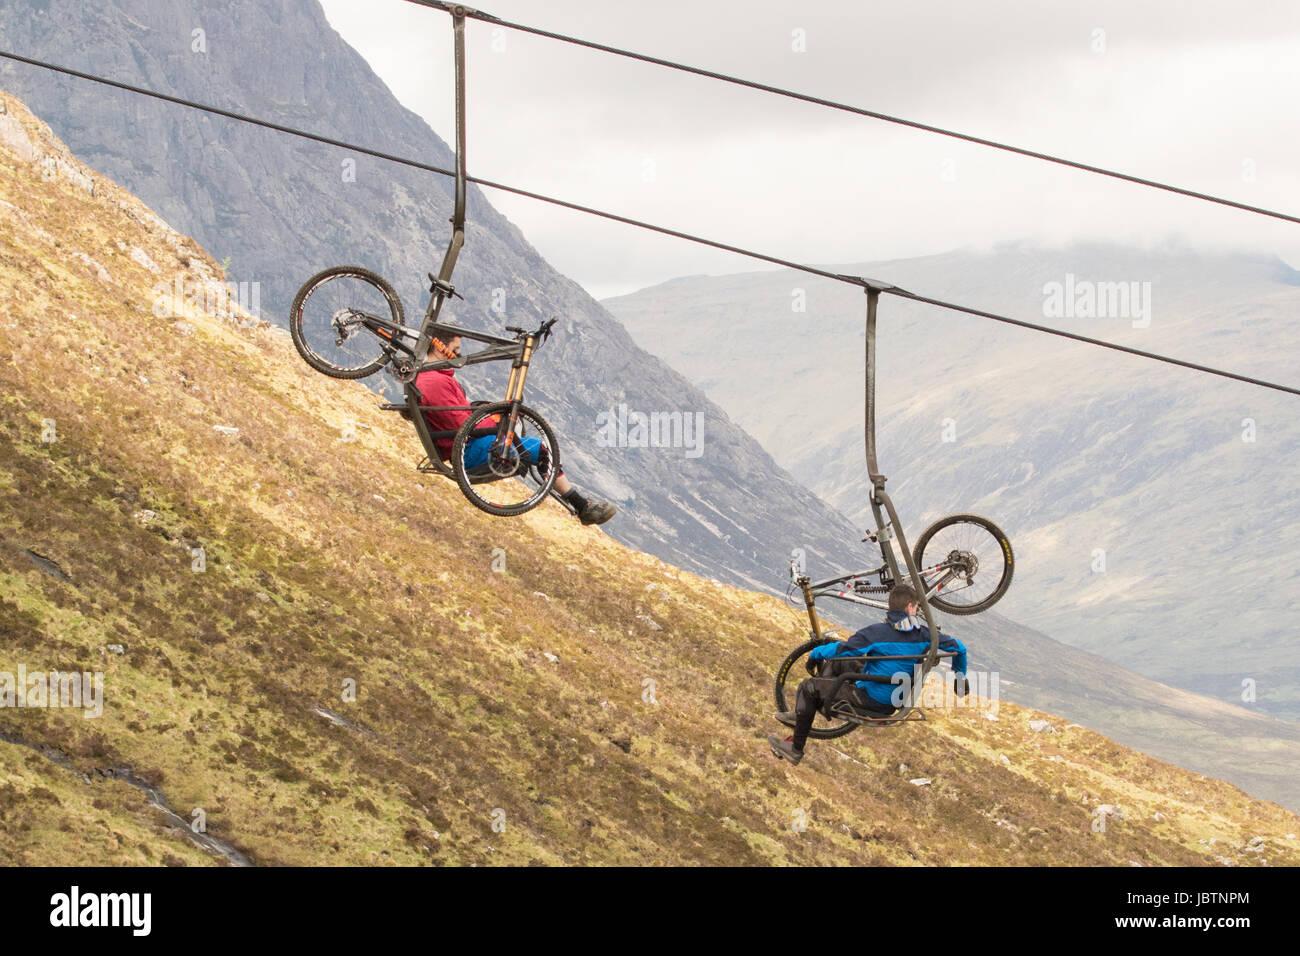 Glencoe mountain mountain biking - downhill mountain bikes on chair lift, to access the Downhhill Track, Glencoe, - Stock Image